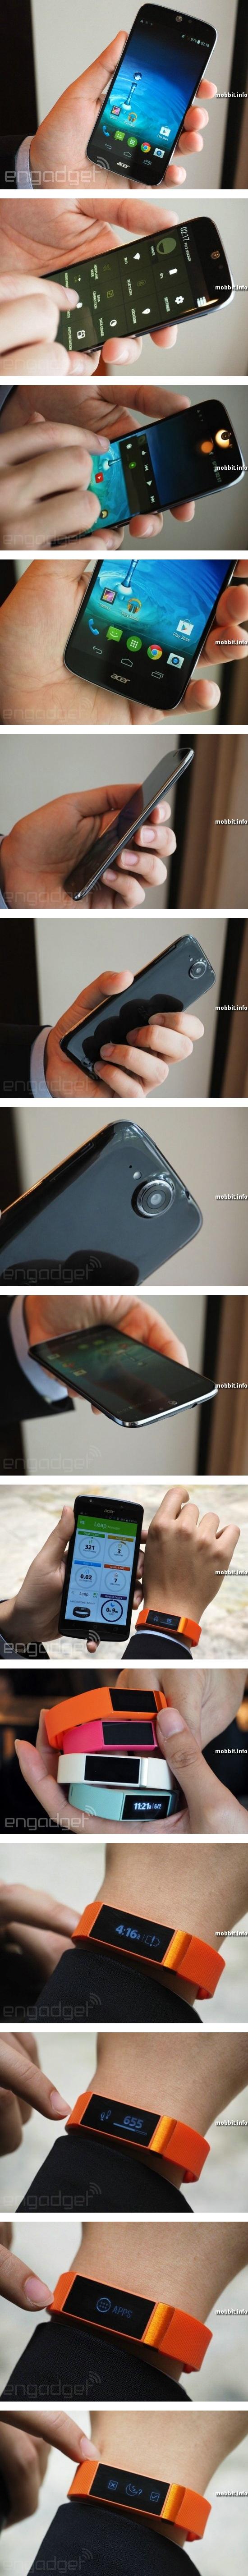 Флагманский смартфон Acer Liquid Jade и фитнес-трекер Acer Liquid Leap